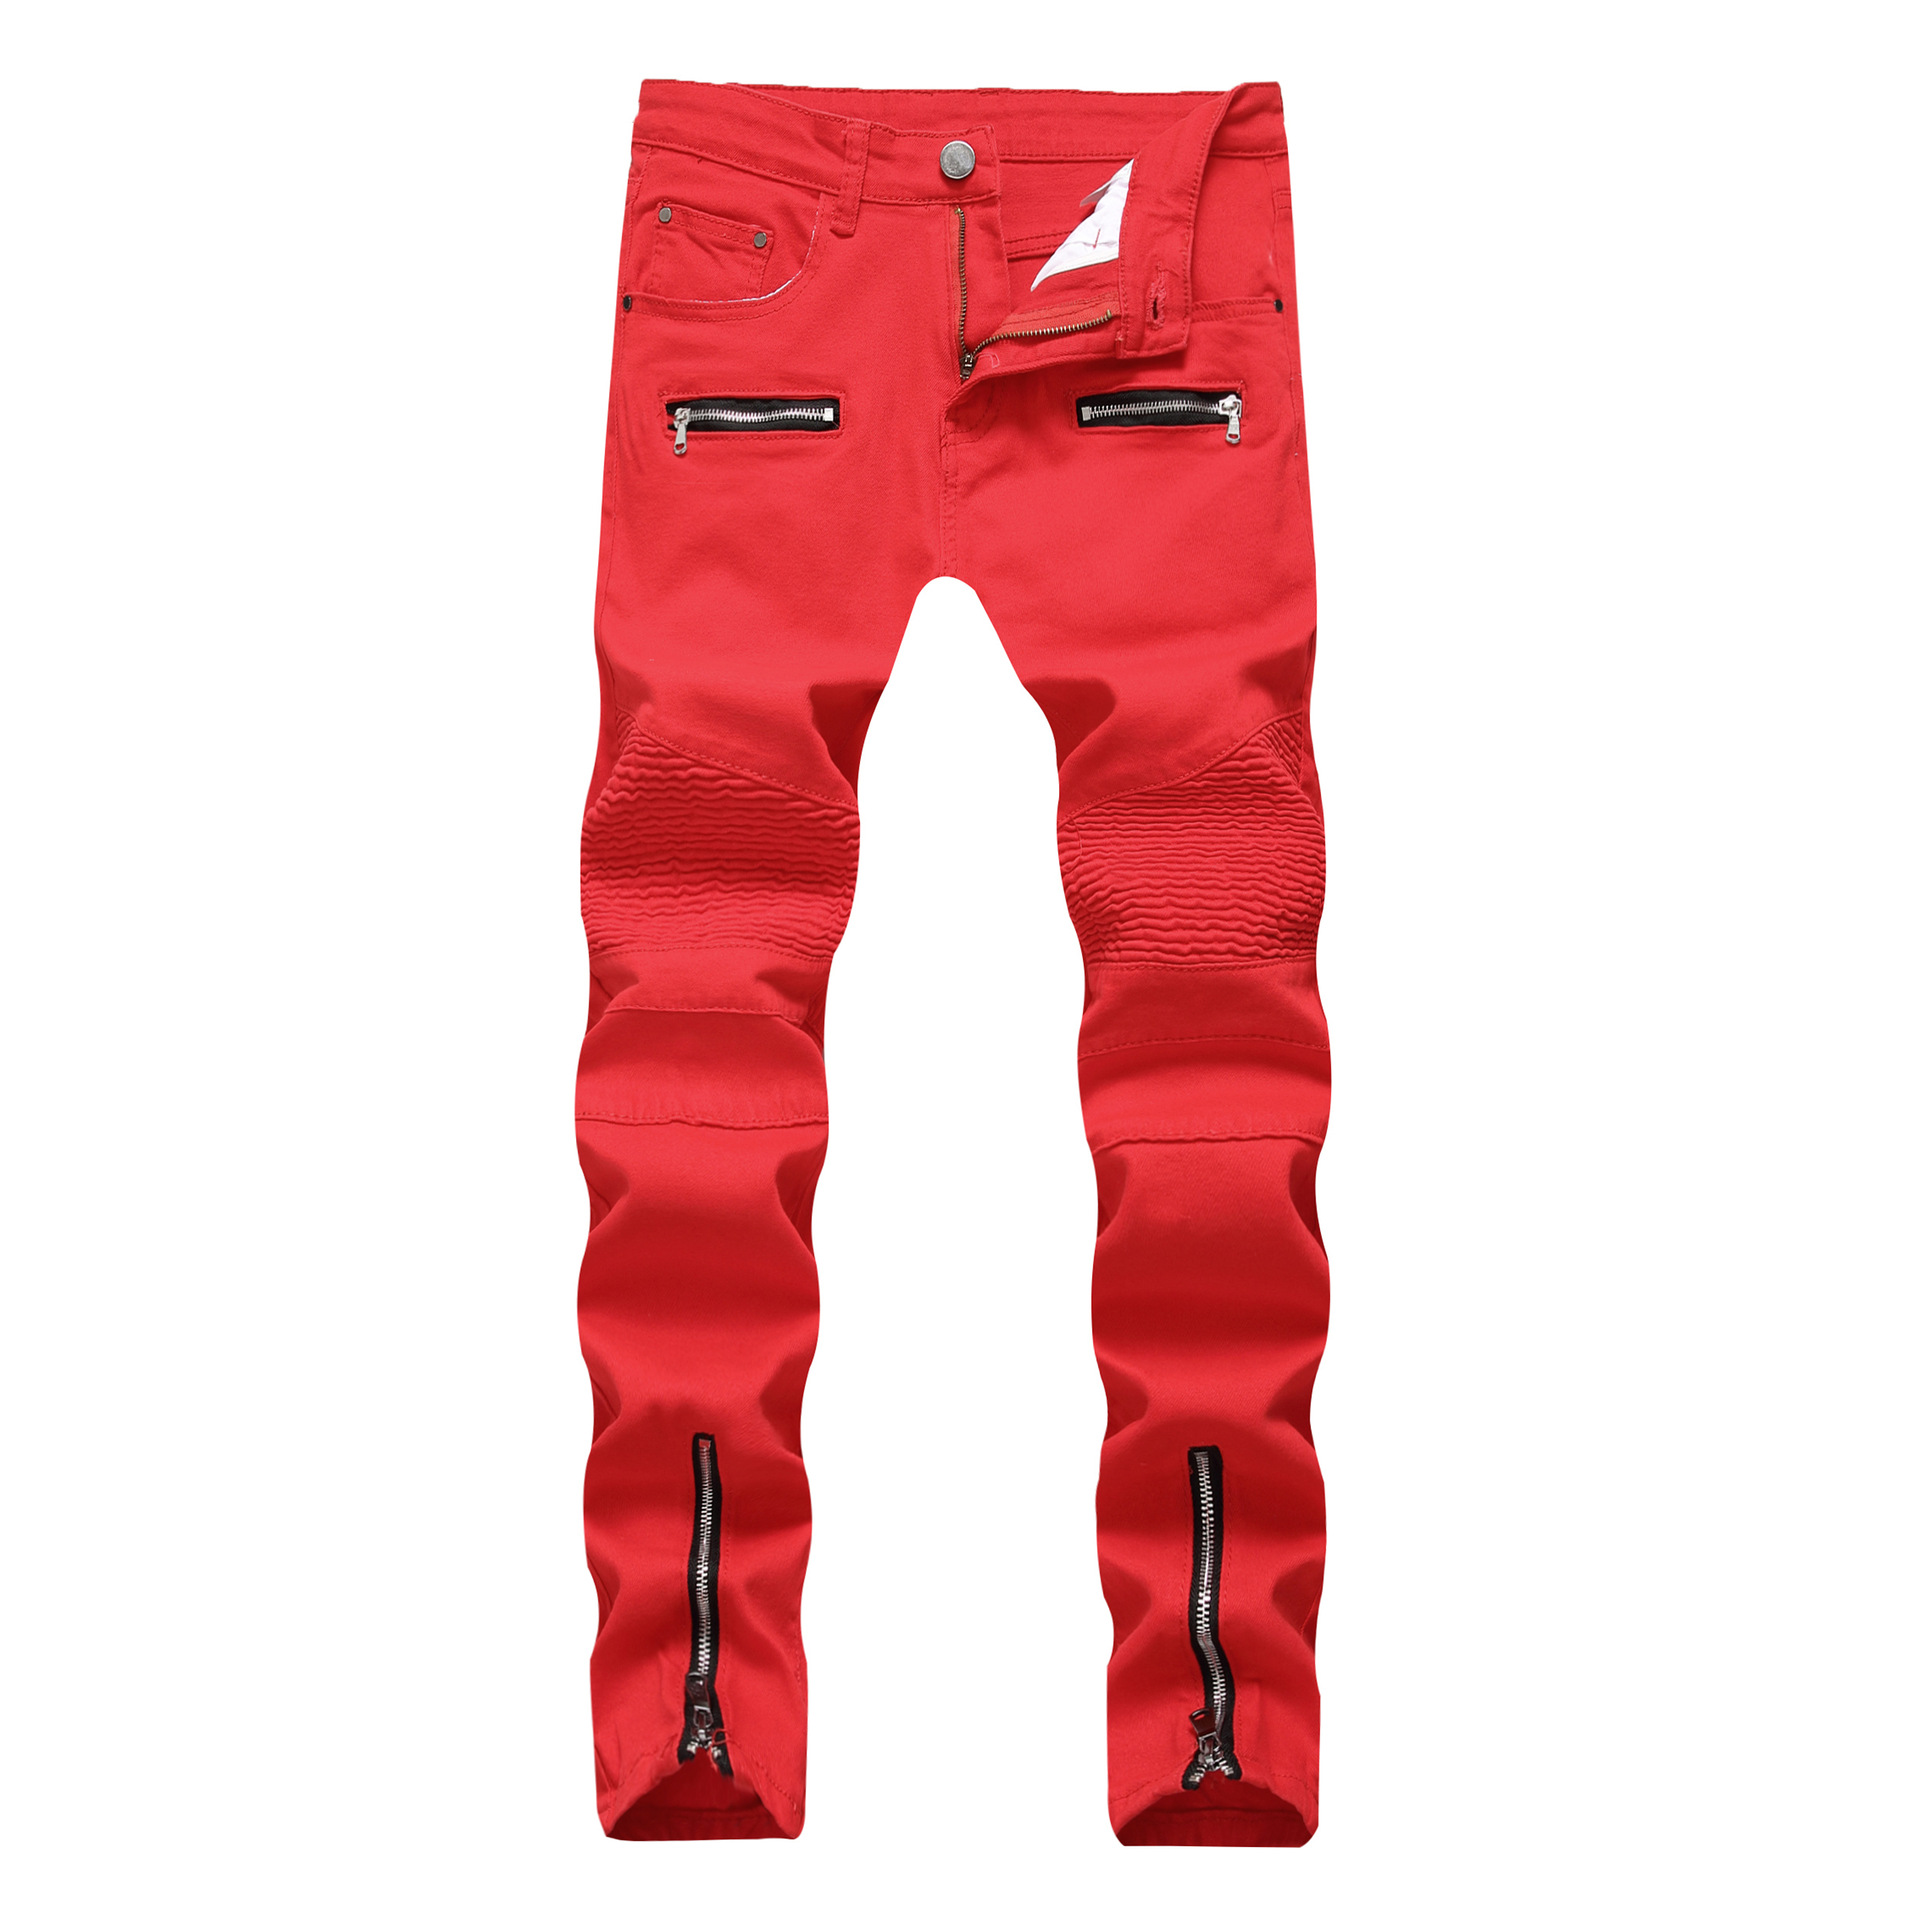 Men high street Motorcycle jeans zipper leisure cowboy trade high elastic denim trousers pleated slim Casual Biker Jeans Cotton